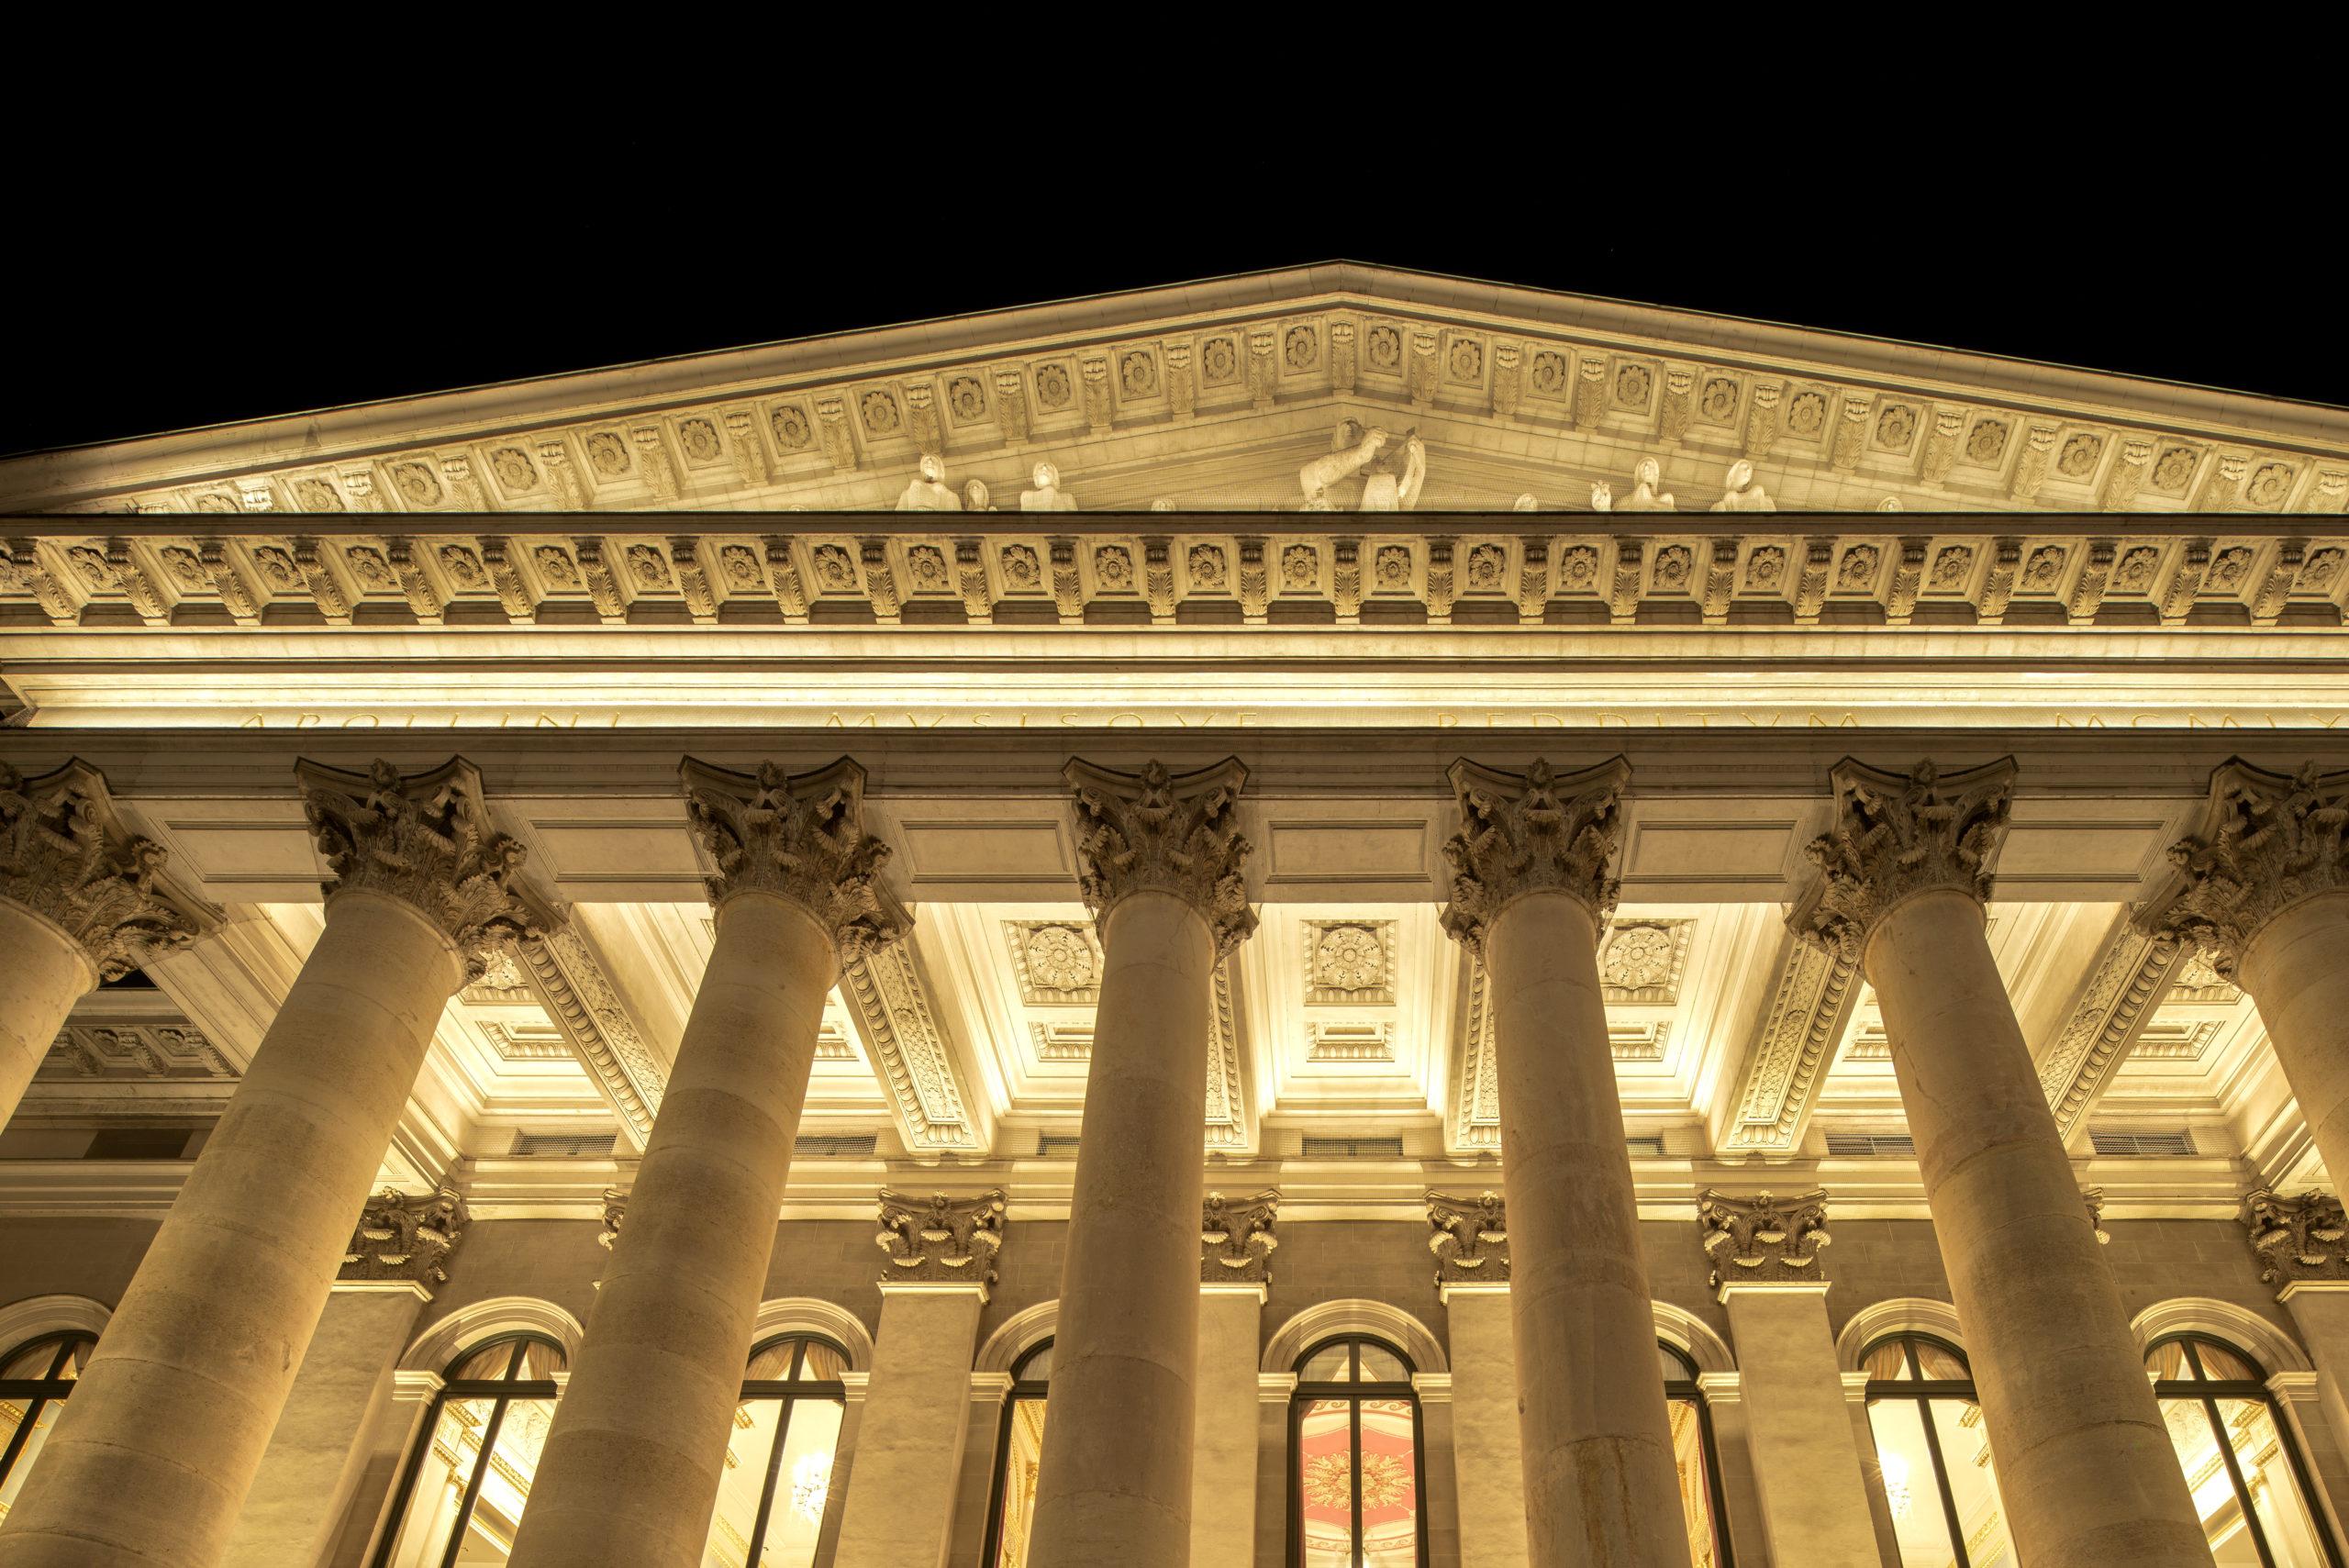 Bayerische Staatsoper, Bavarian State Opera, Nationaltheater, opera, music, architecture, exterior, pillars, columns, Munich, Muenchen